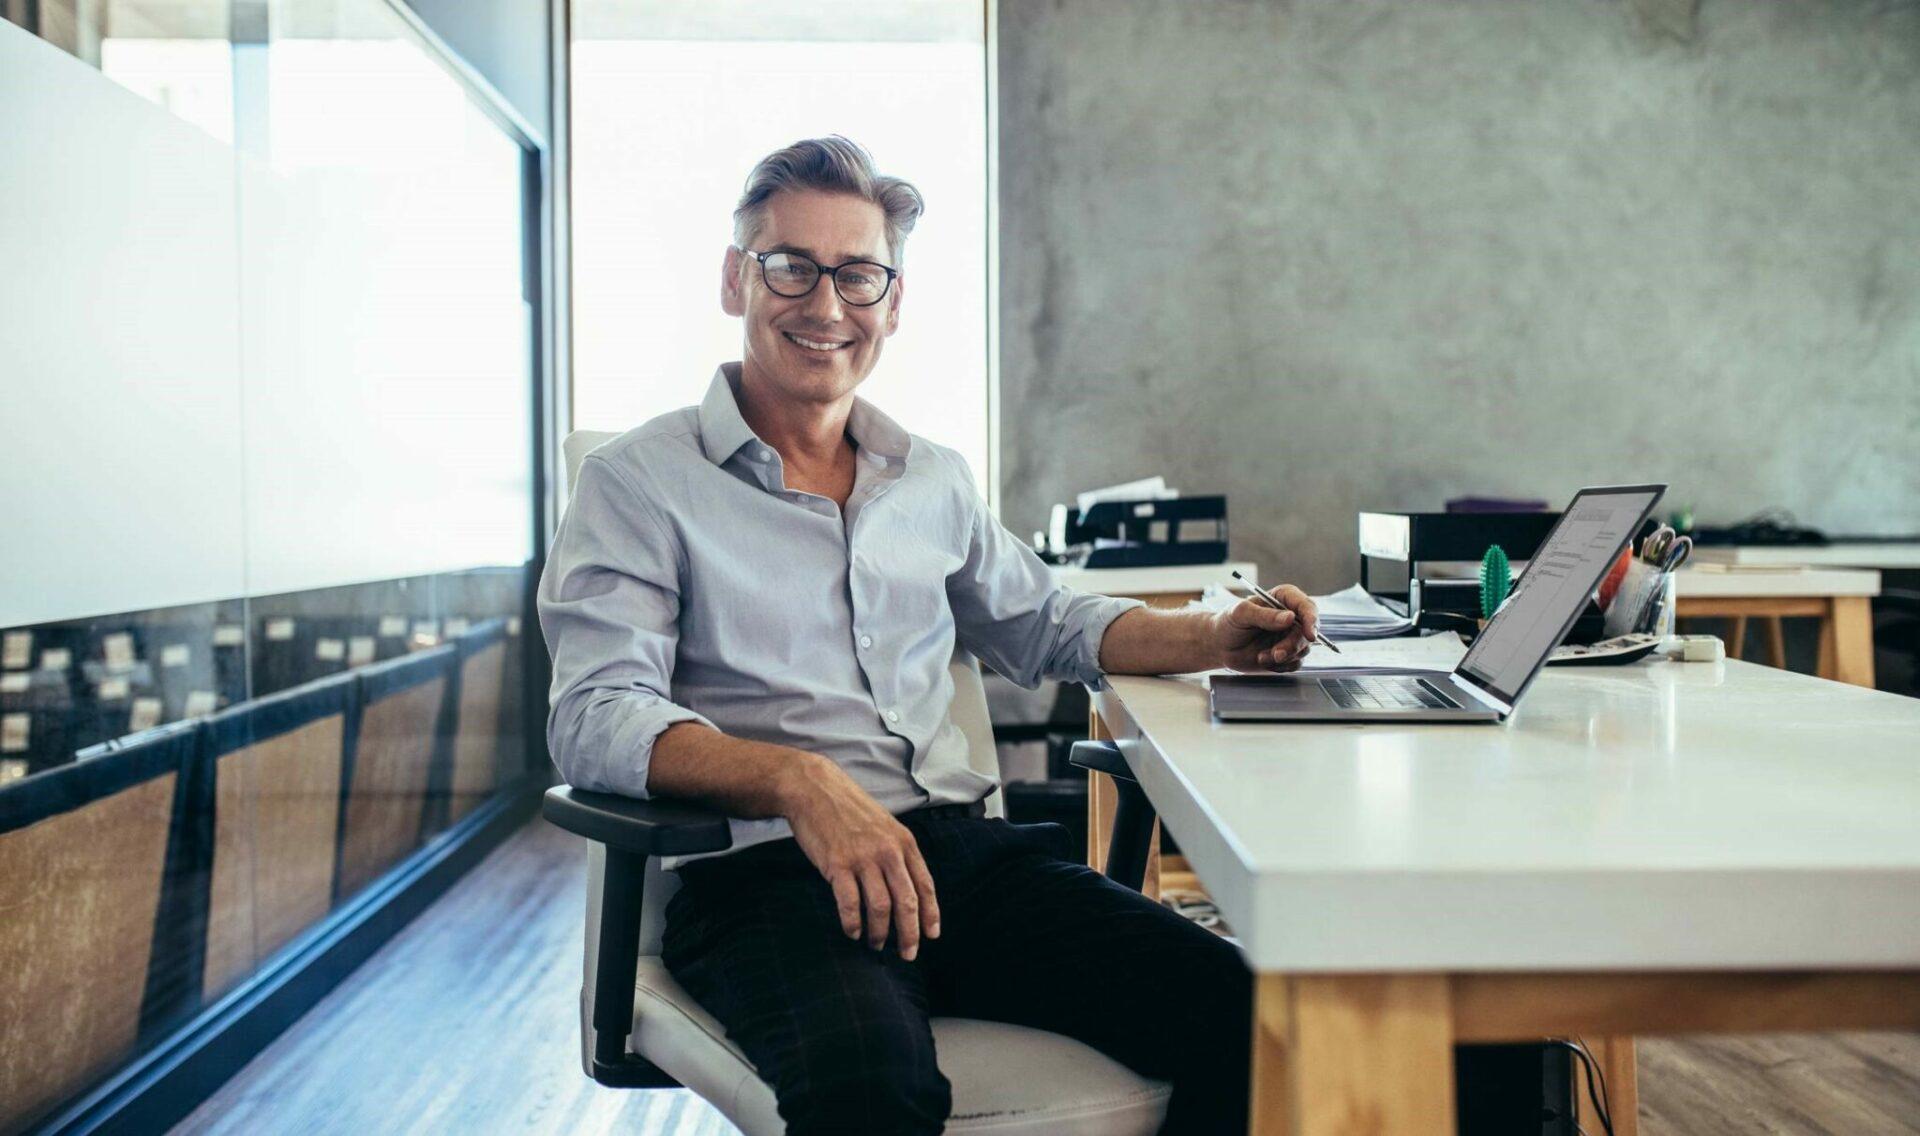 self-employed startup